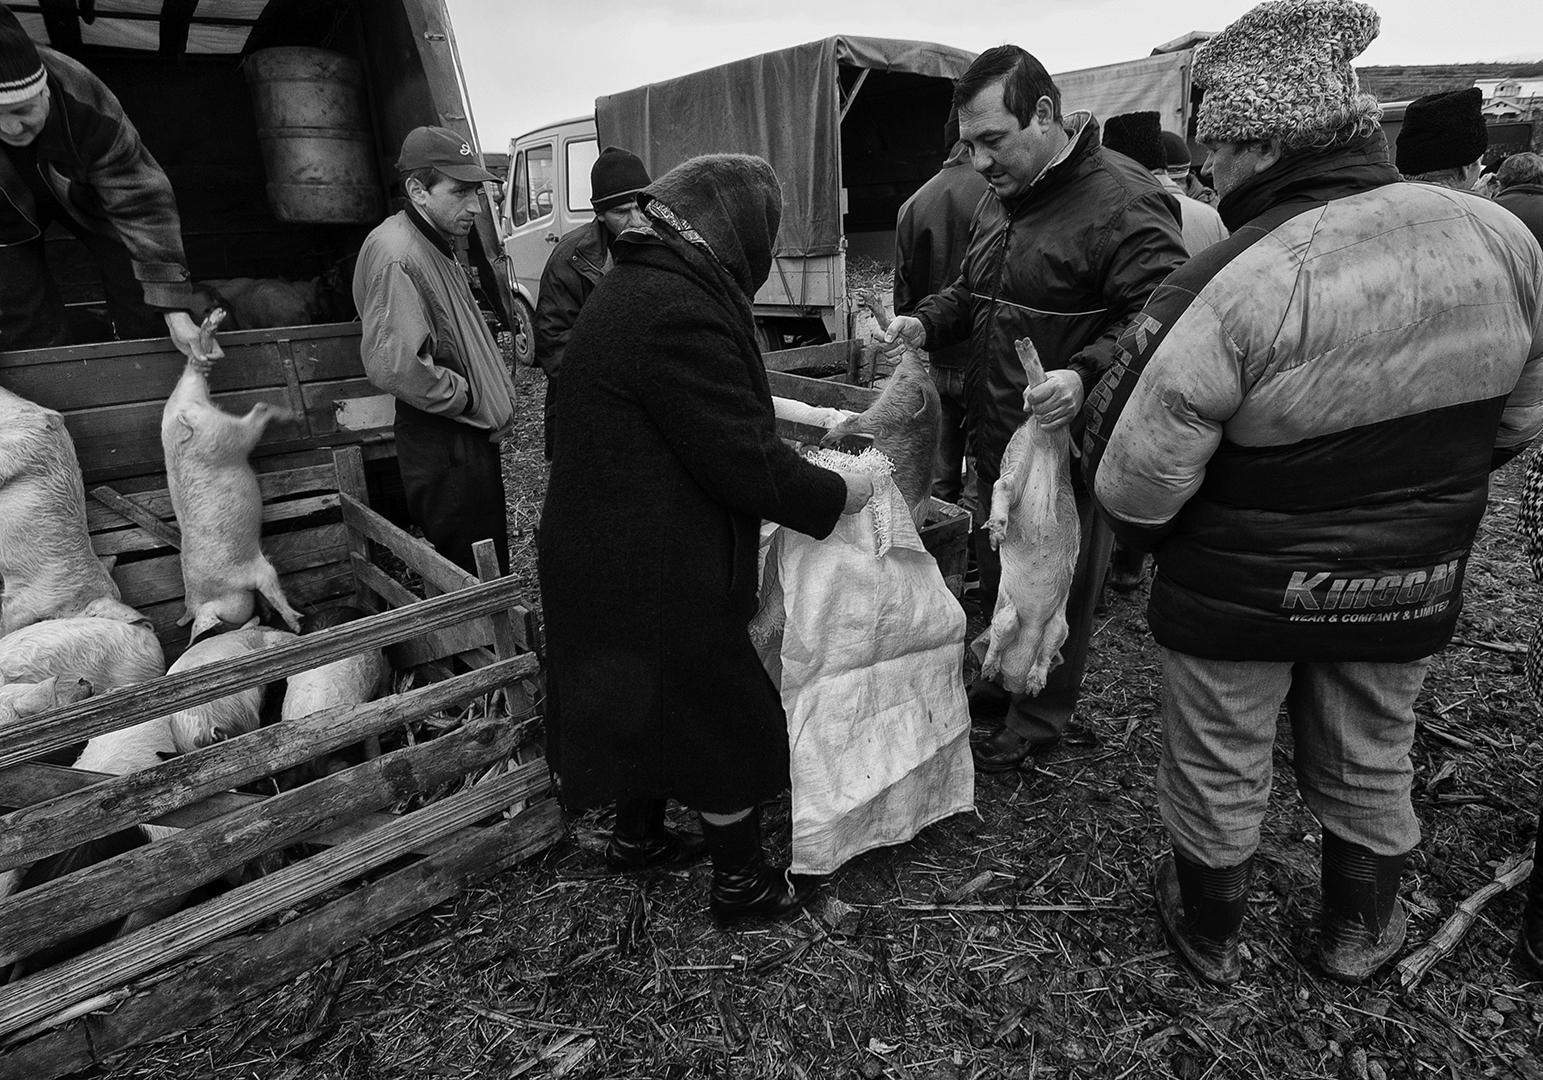 Pig trade, Søren Skov